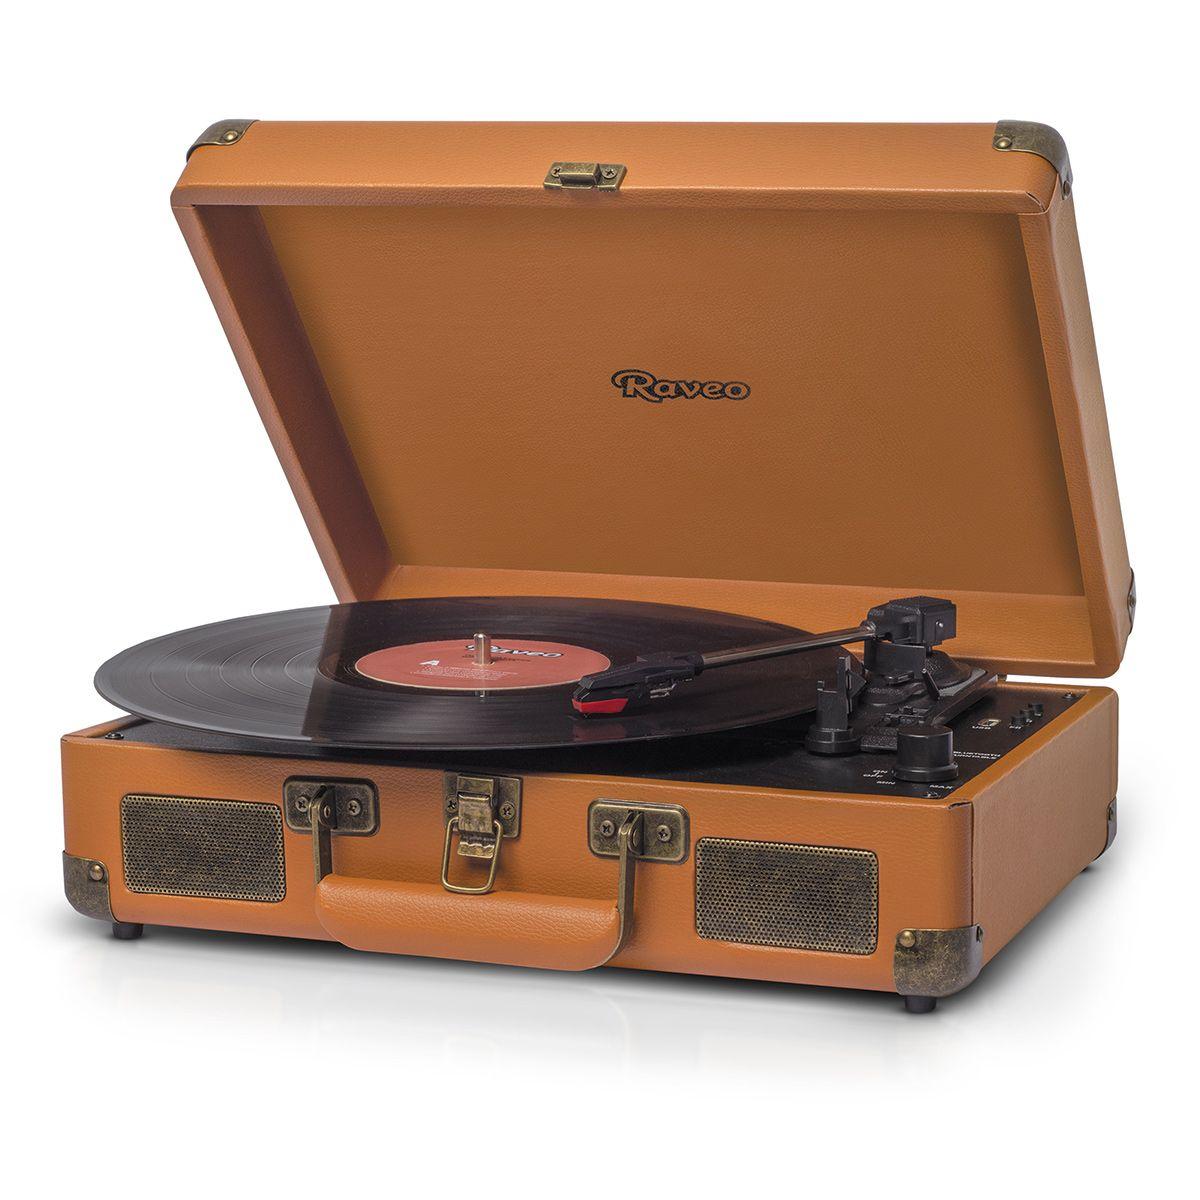 Vitrola Raveo Sonetto Caramelo c/ Toca Disco, bluetooth, USB Rec Selo Anatel